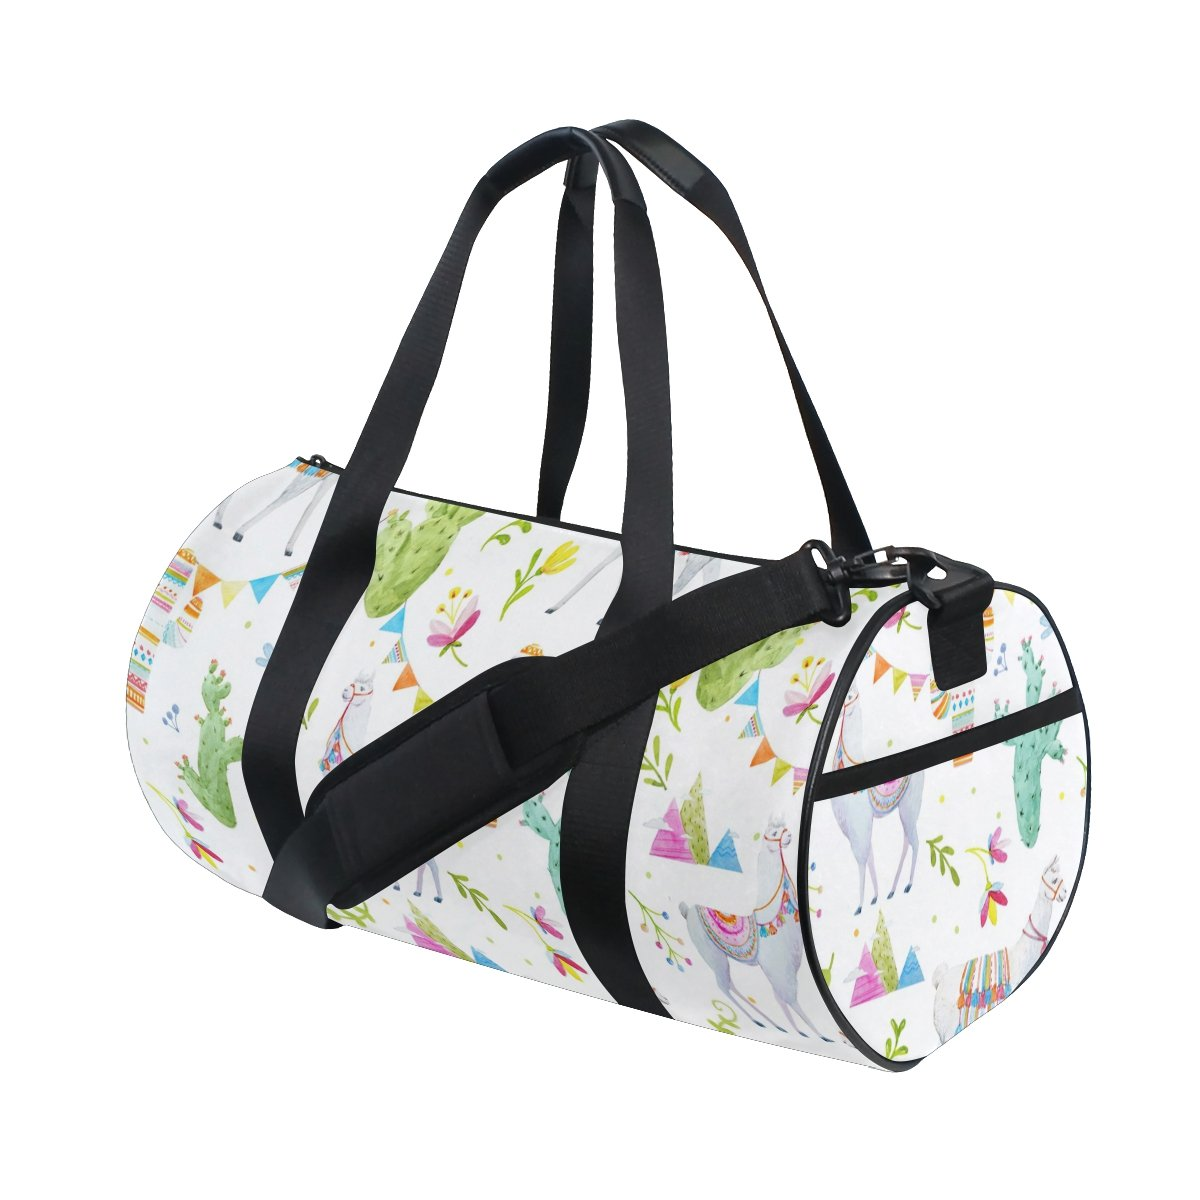 Naanle Watercolor Llama Alpaca Cactus Flag Mountain Gym bag Sports Travel Duffle Bags for Men Women Boys Girls Kids